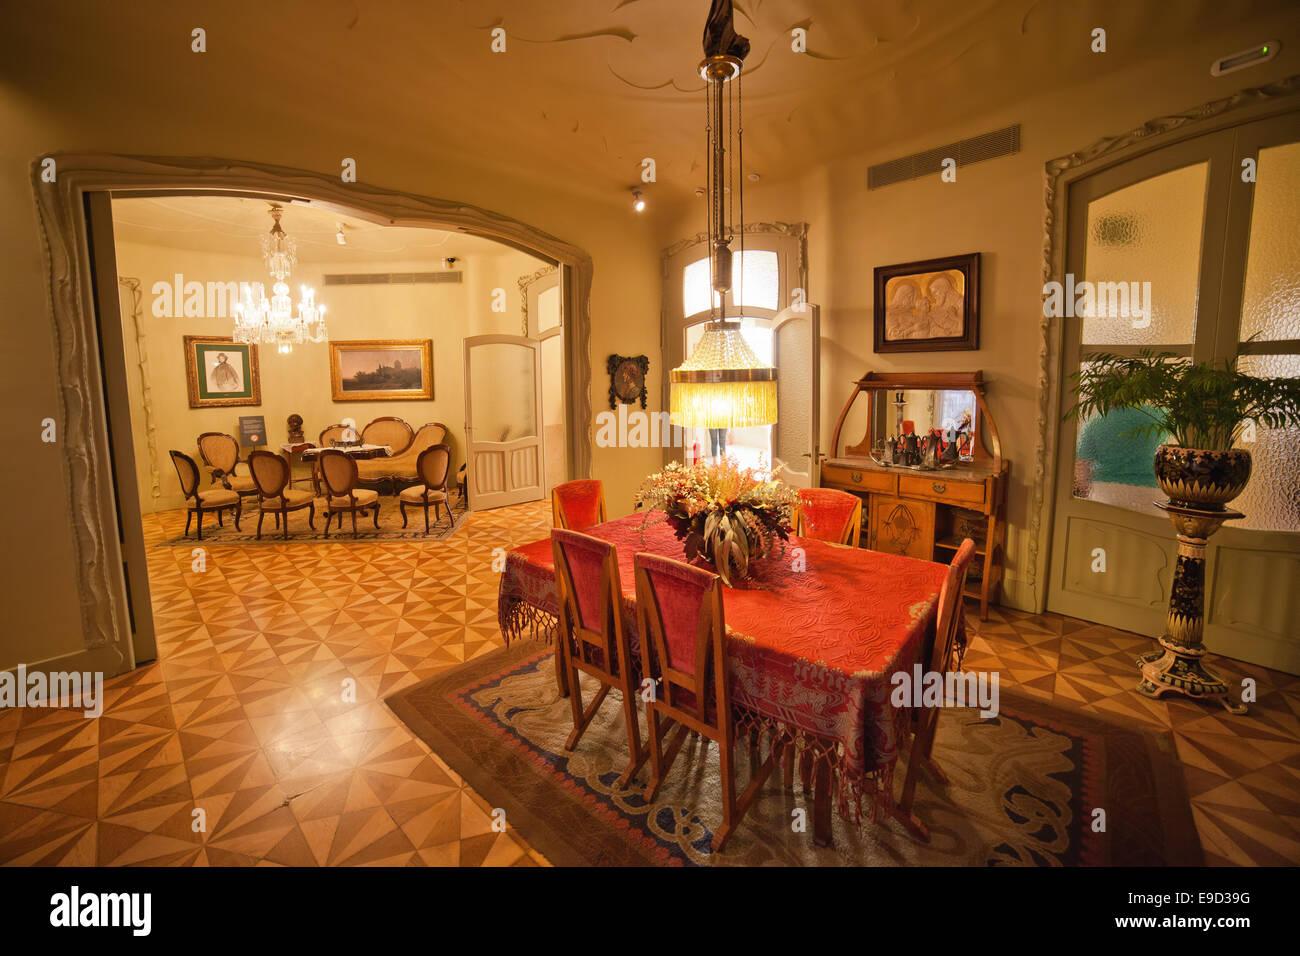 Dining Room Of The Casa Mila La Pedrera By Antoni Gaudi